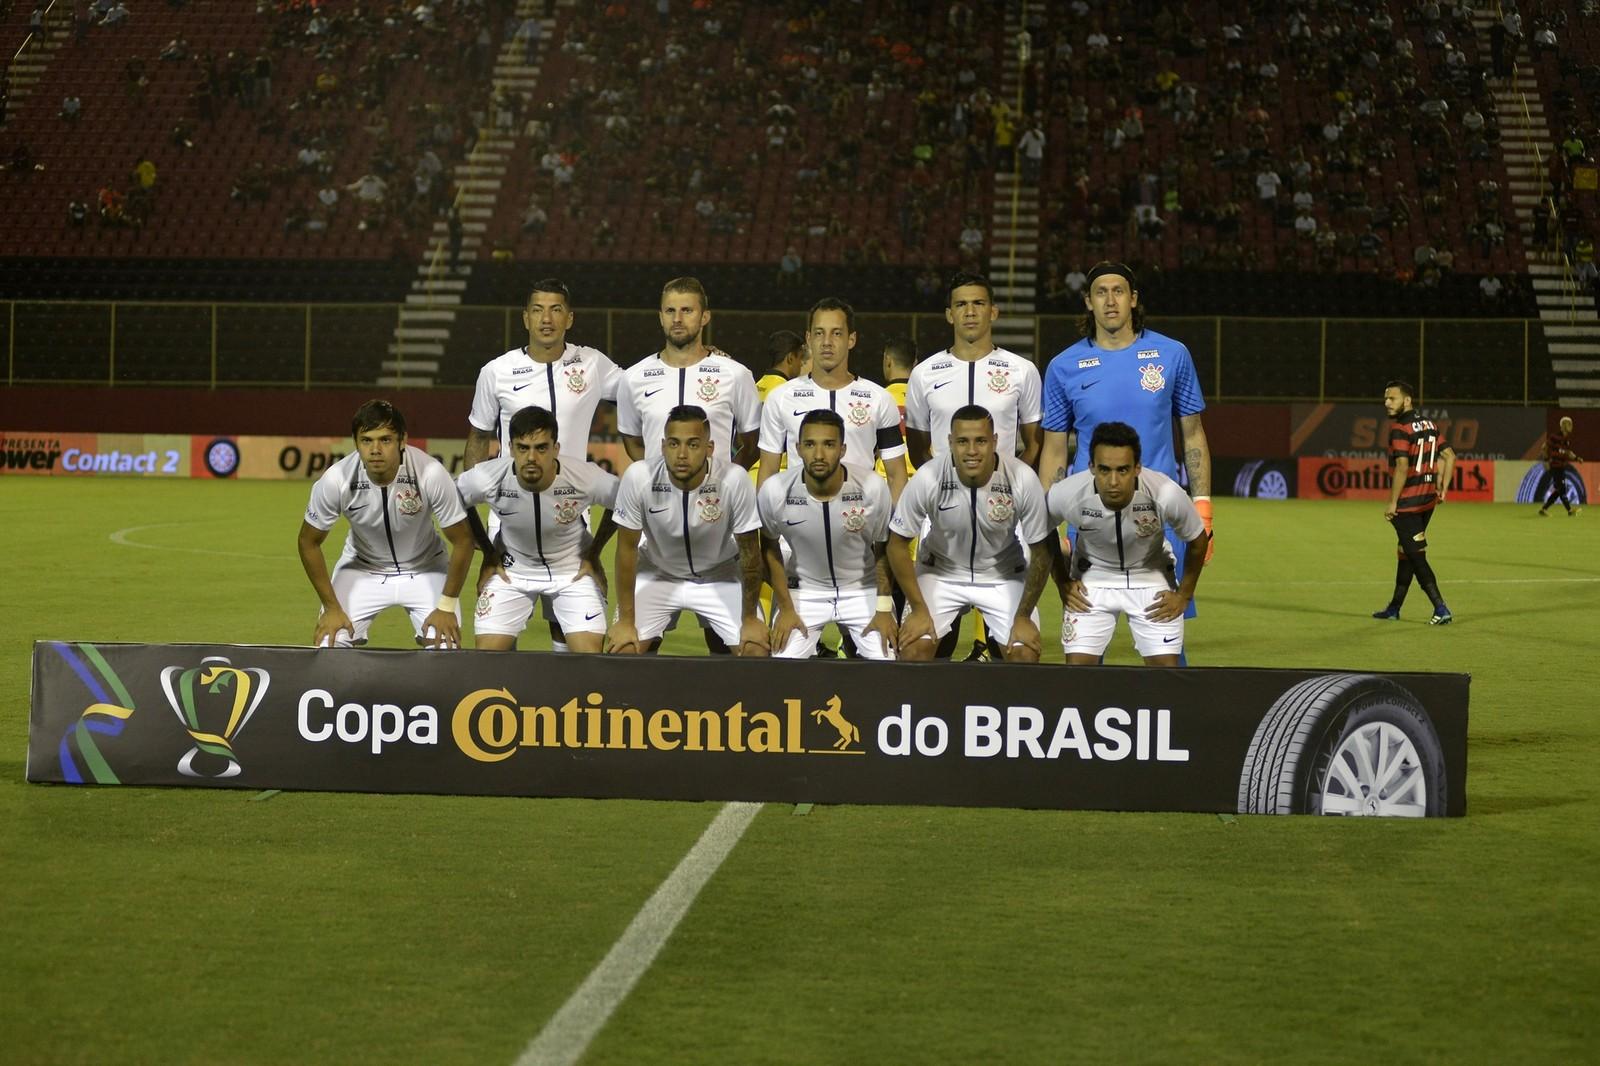 Vitória 0 x 0 Corinthians - Copa do Brasil 2018